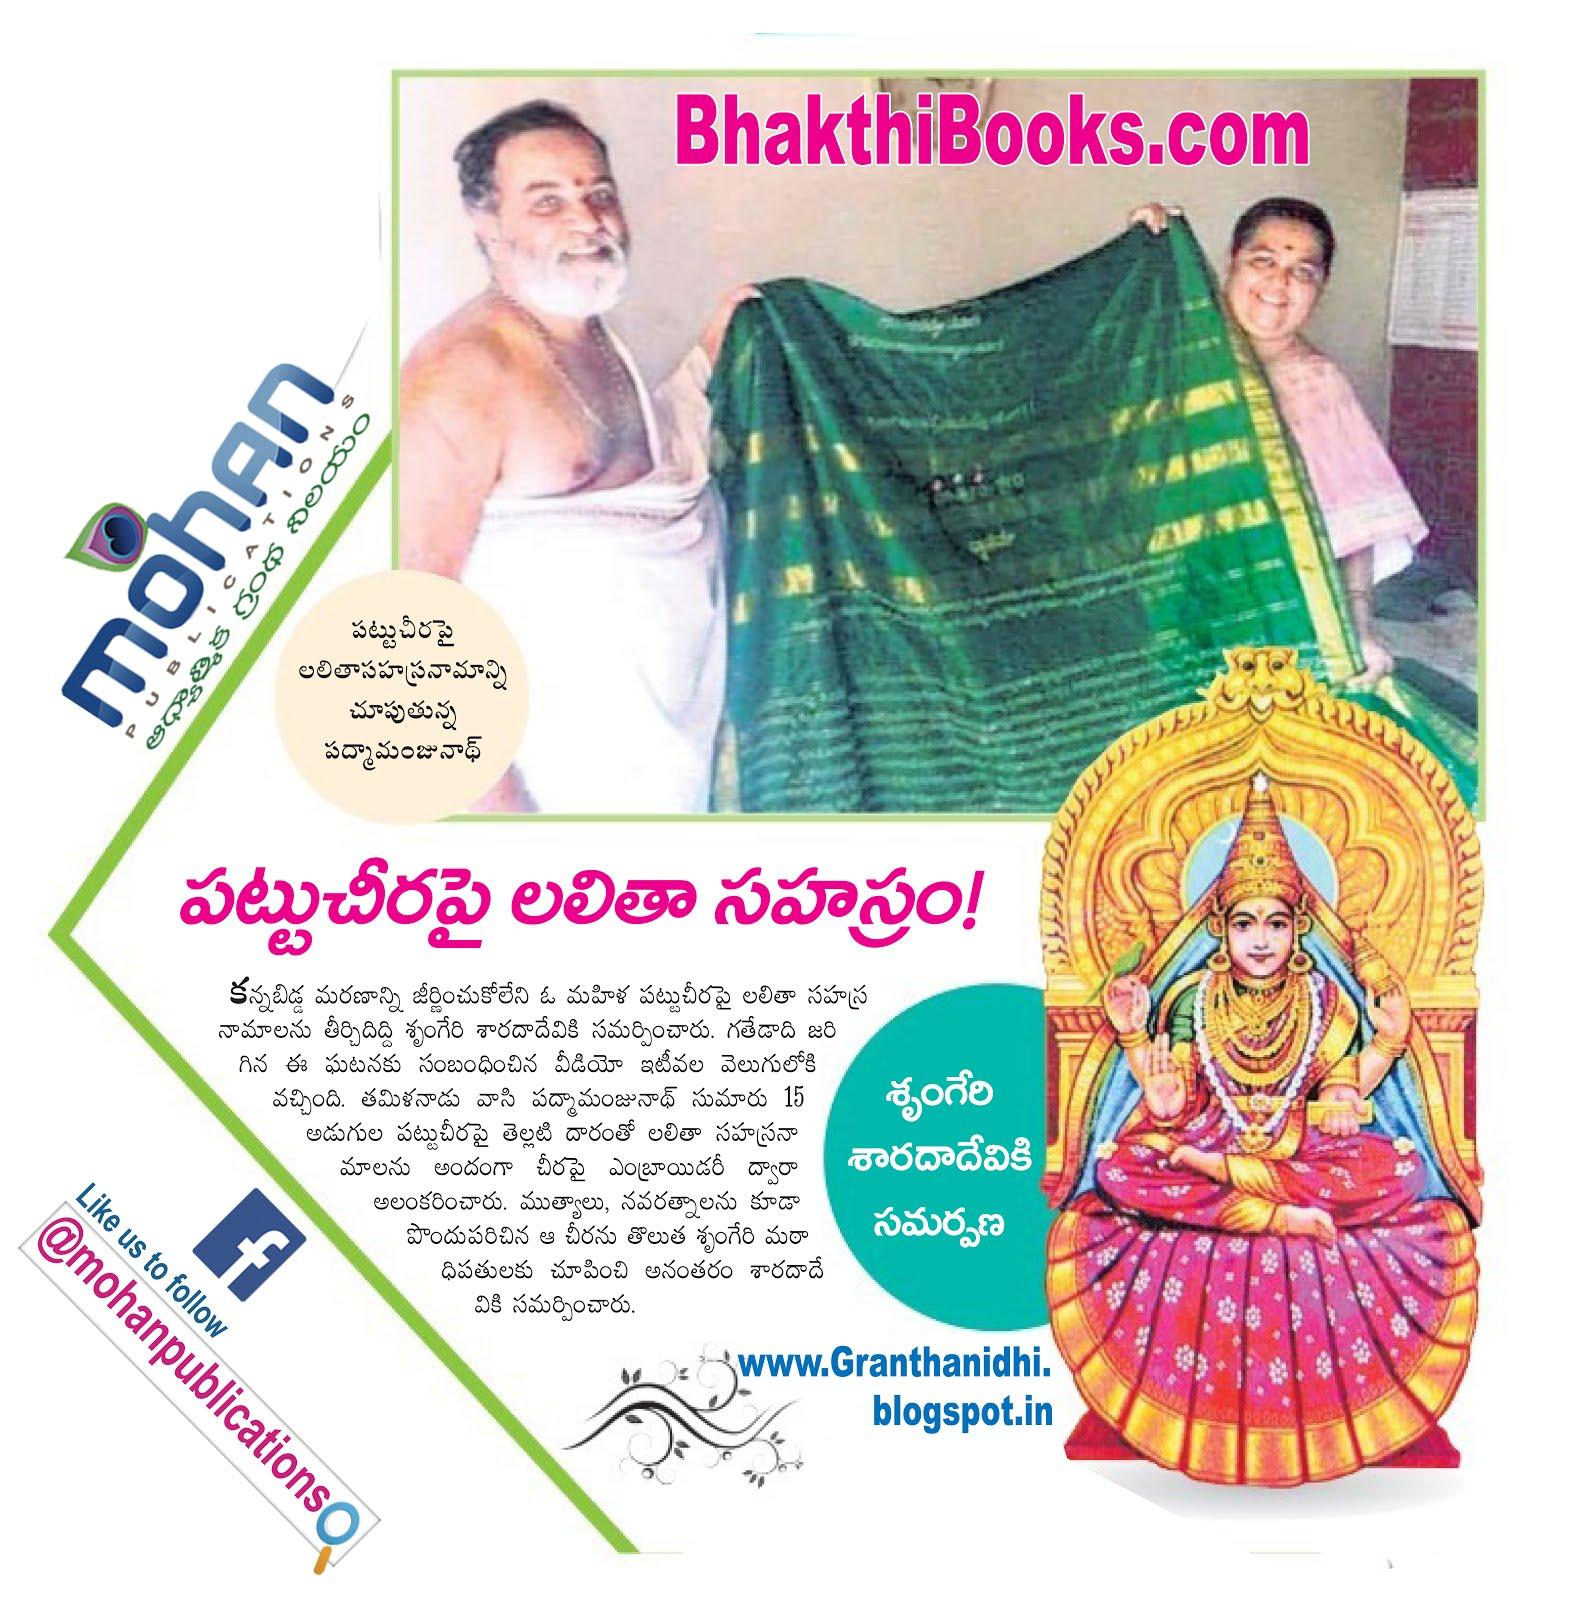 granthanidhi mohanpublications bhaktibooks సోమవారం నాడు                 పారాయణం చేయవలసిన స్తోత్రములు